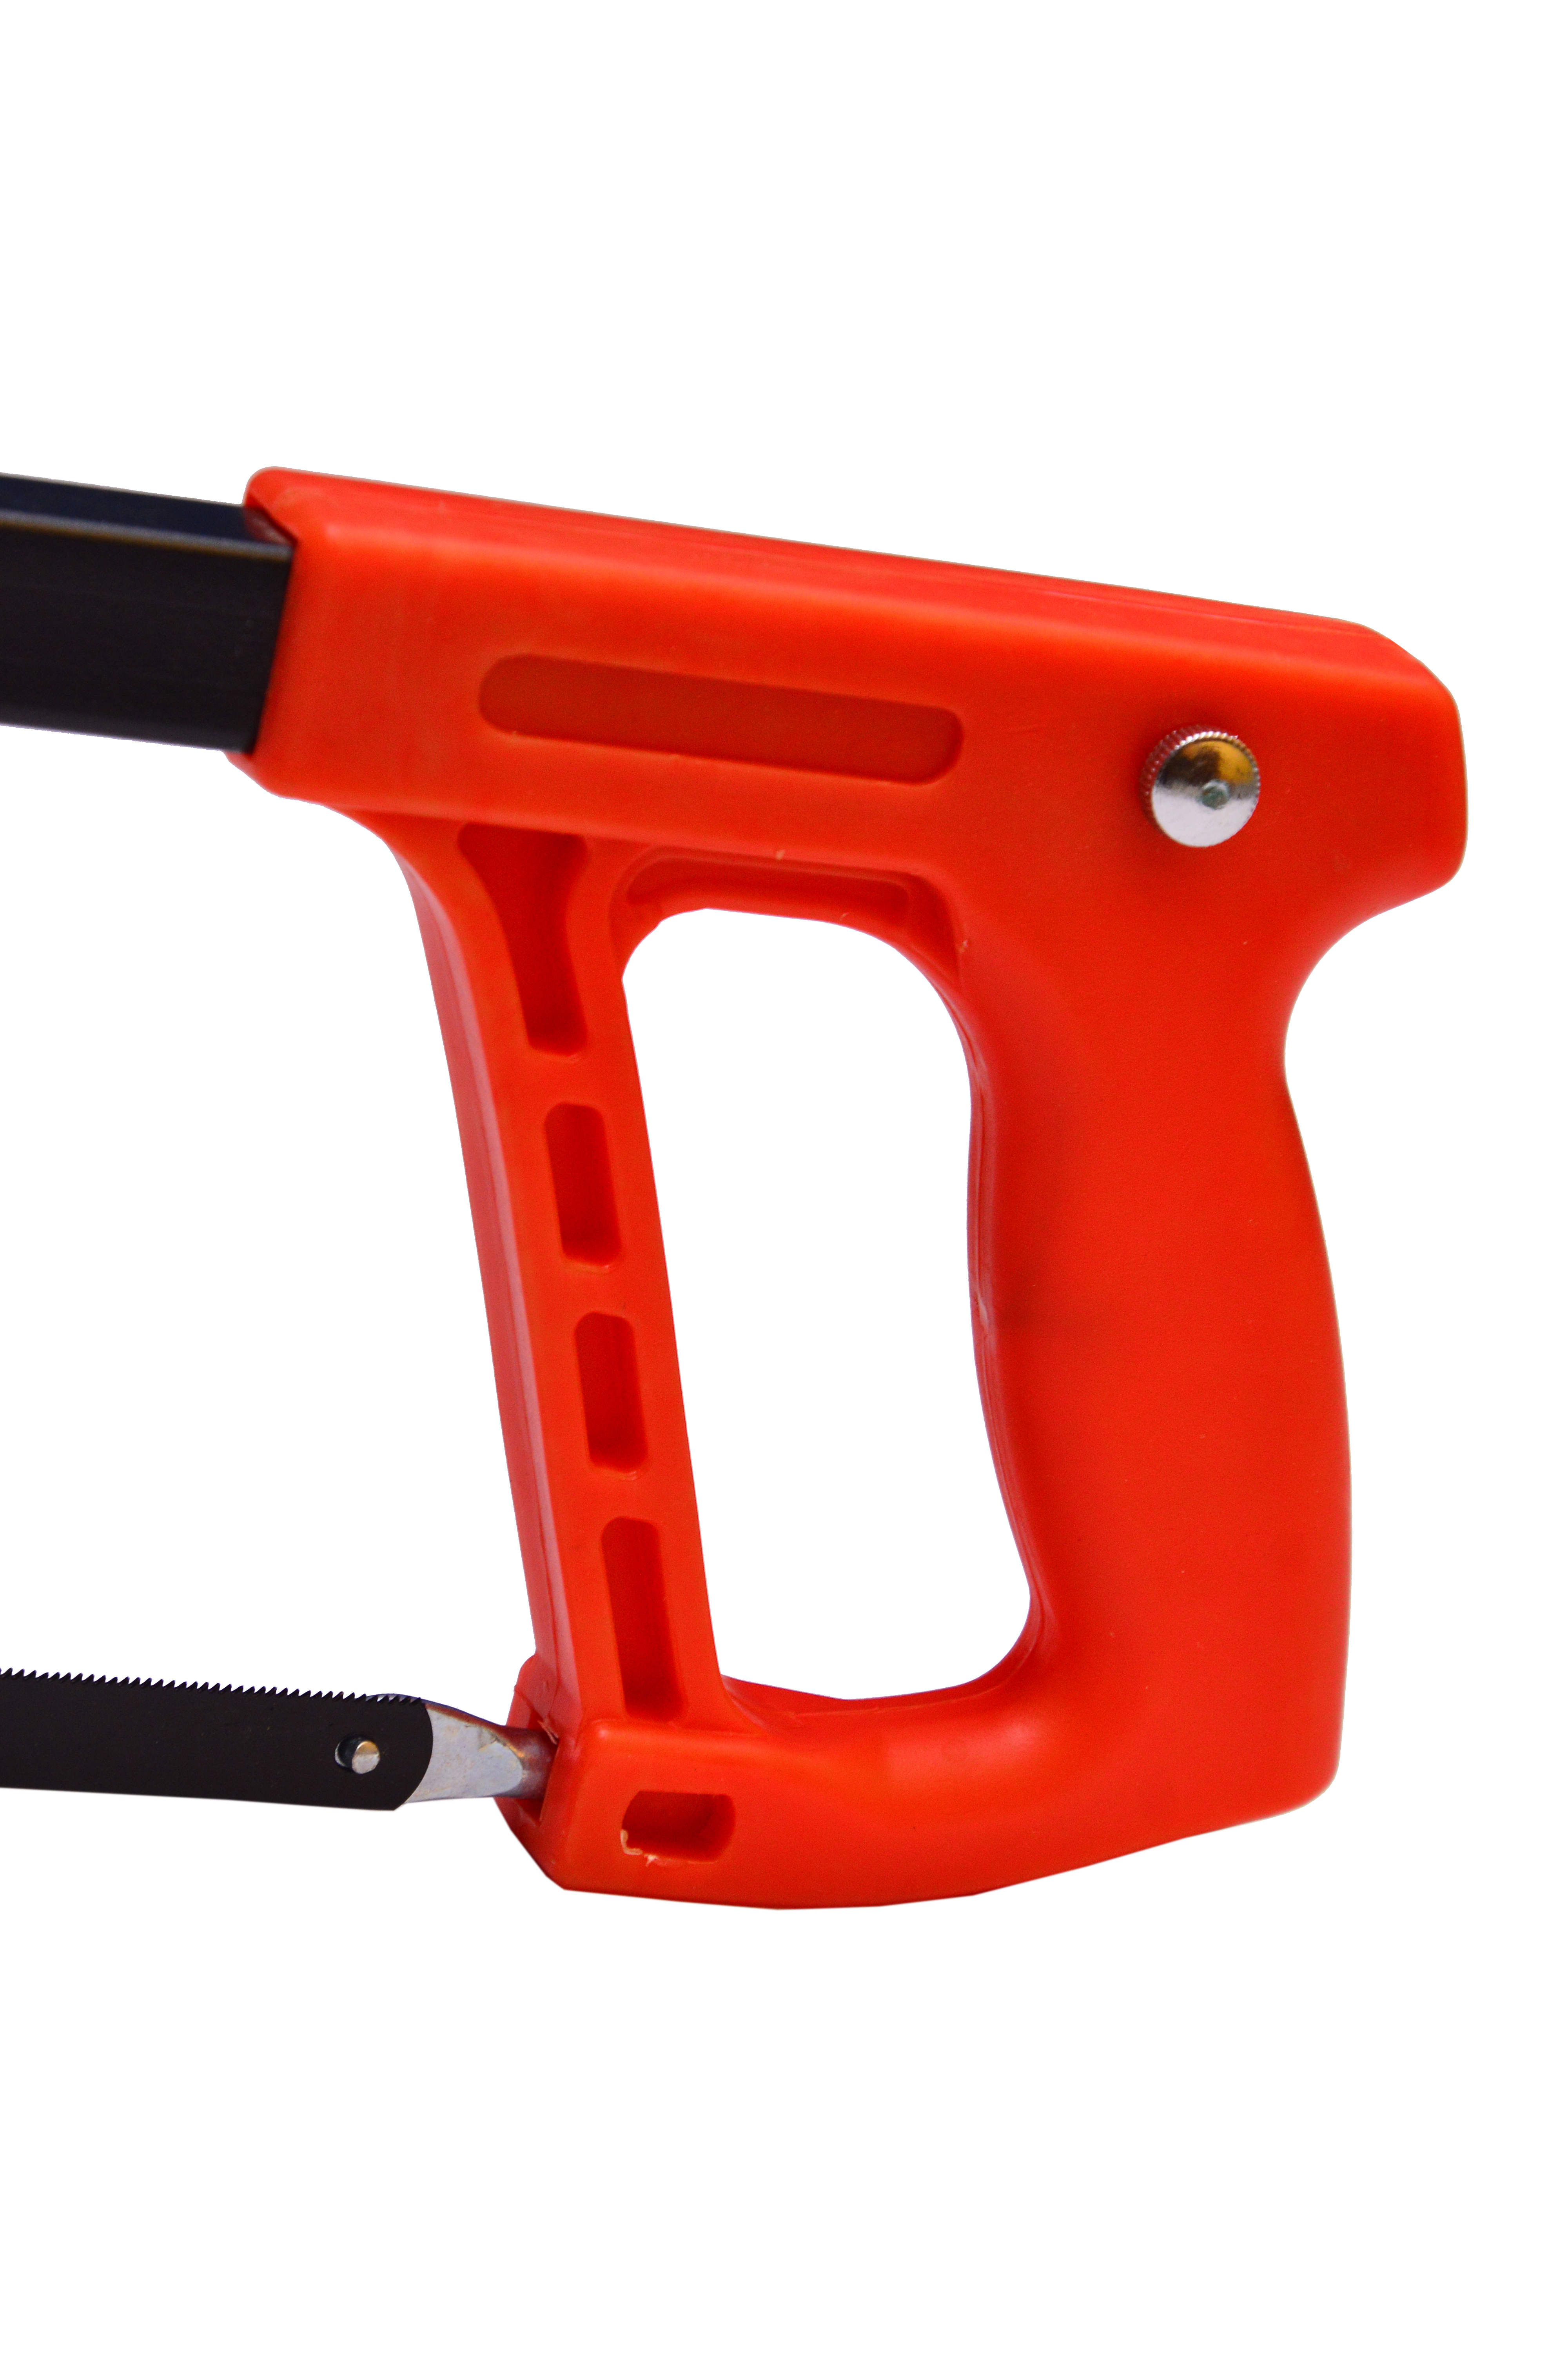 Hacksaw Frame with Plastic Handle